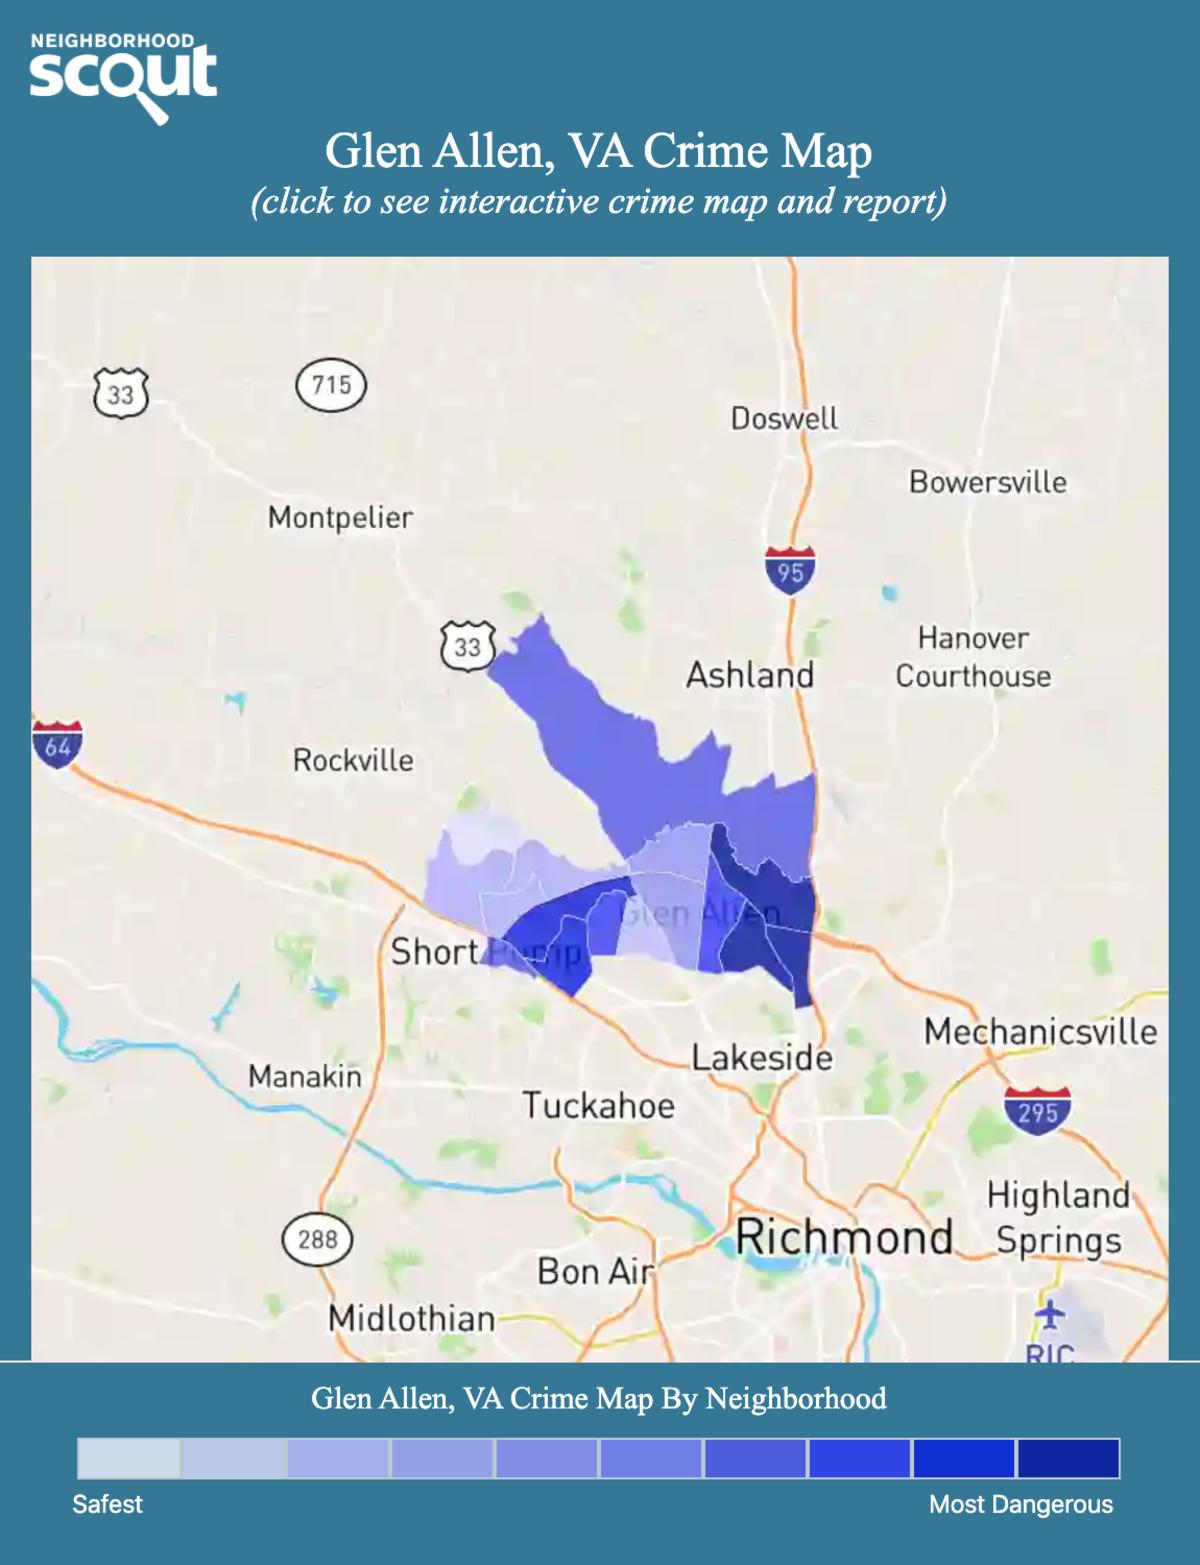 Glen Allen, Virginia crime map